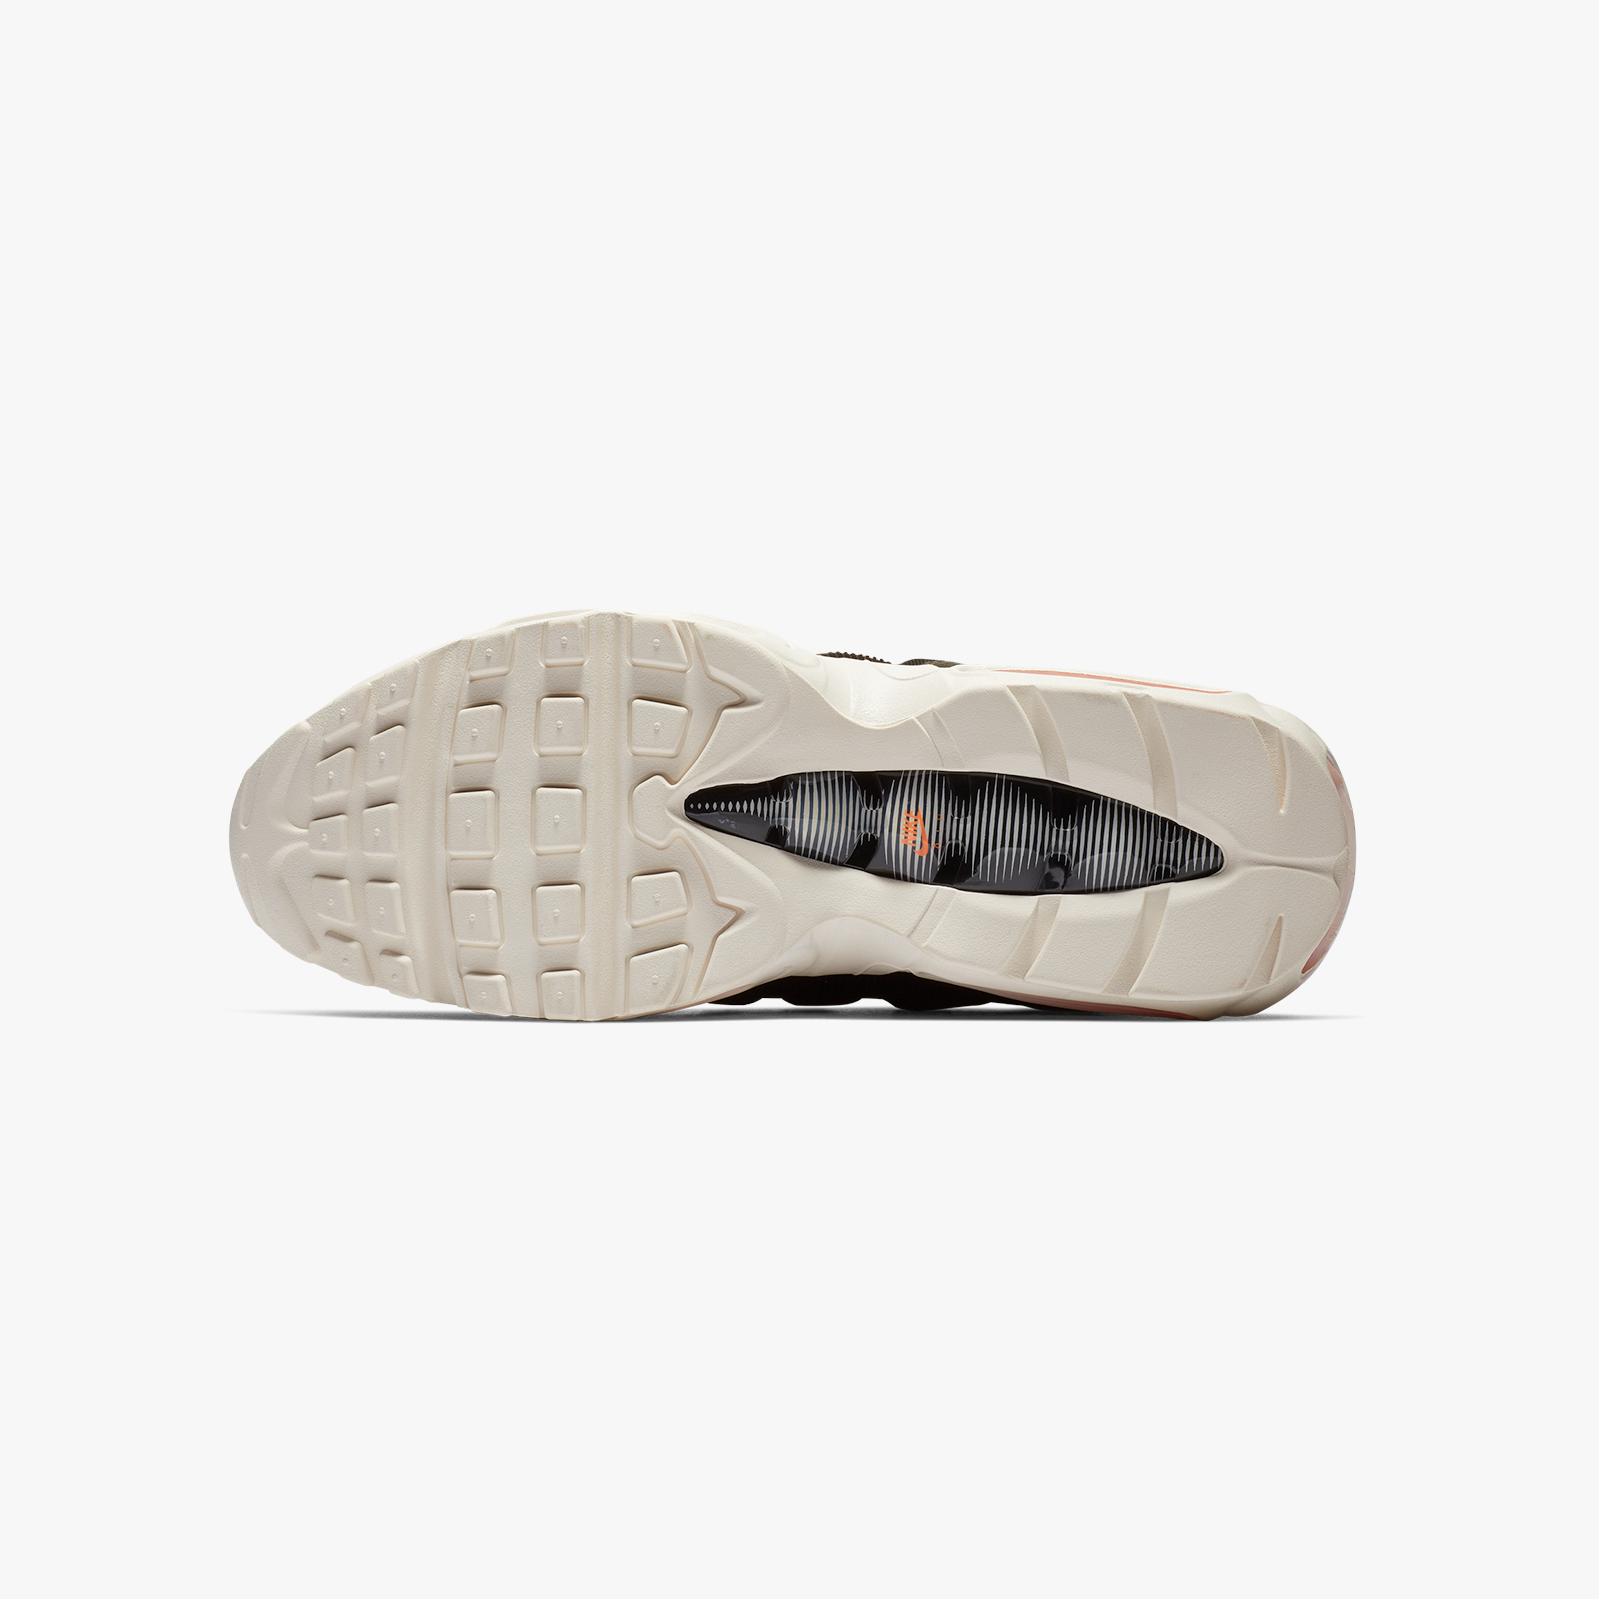 Nike Air Max 95 x Carhartt WIP - Av3866-001 - Sneakersnstuff ... e2591850f